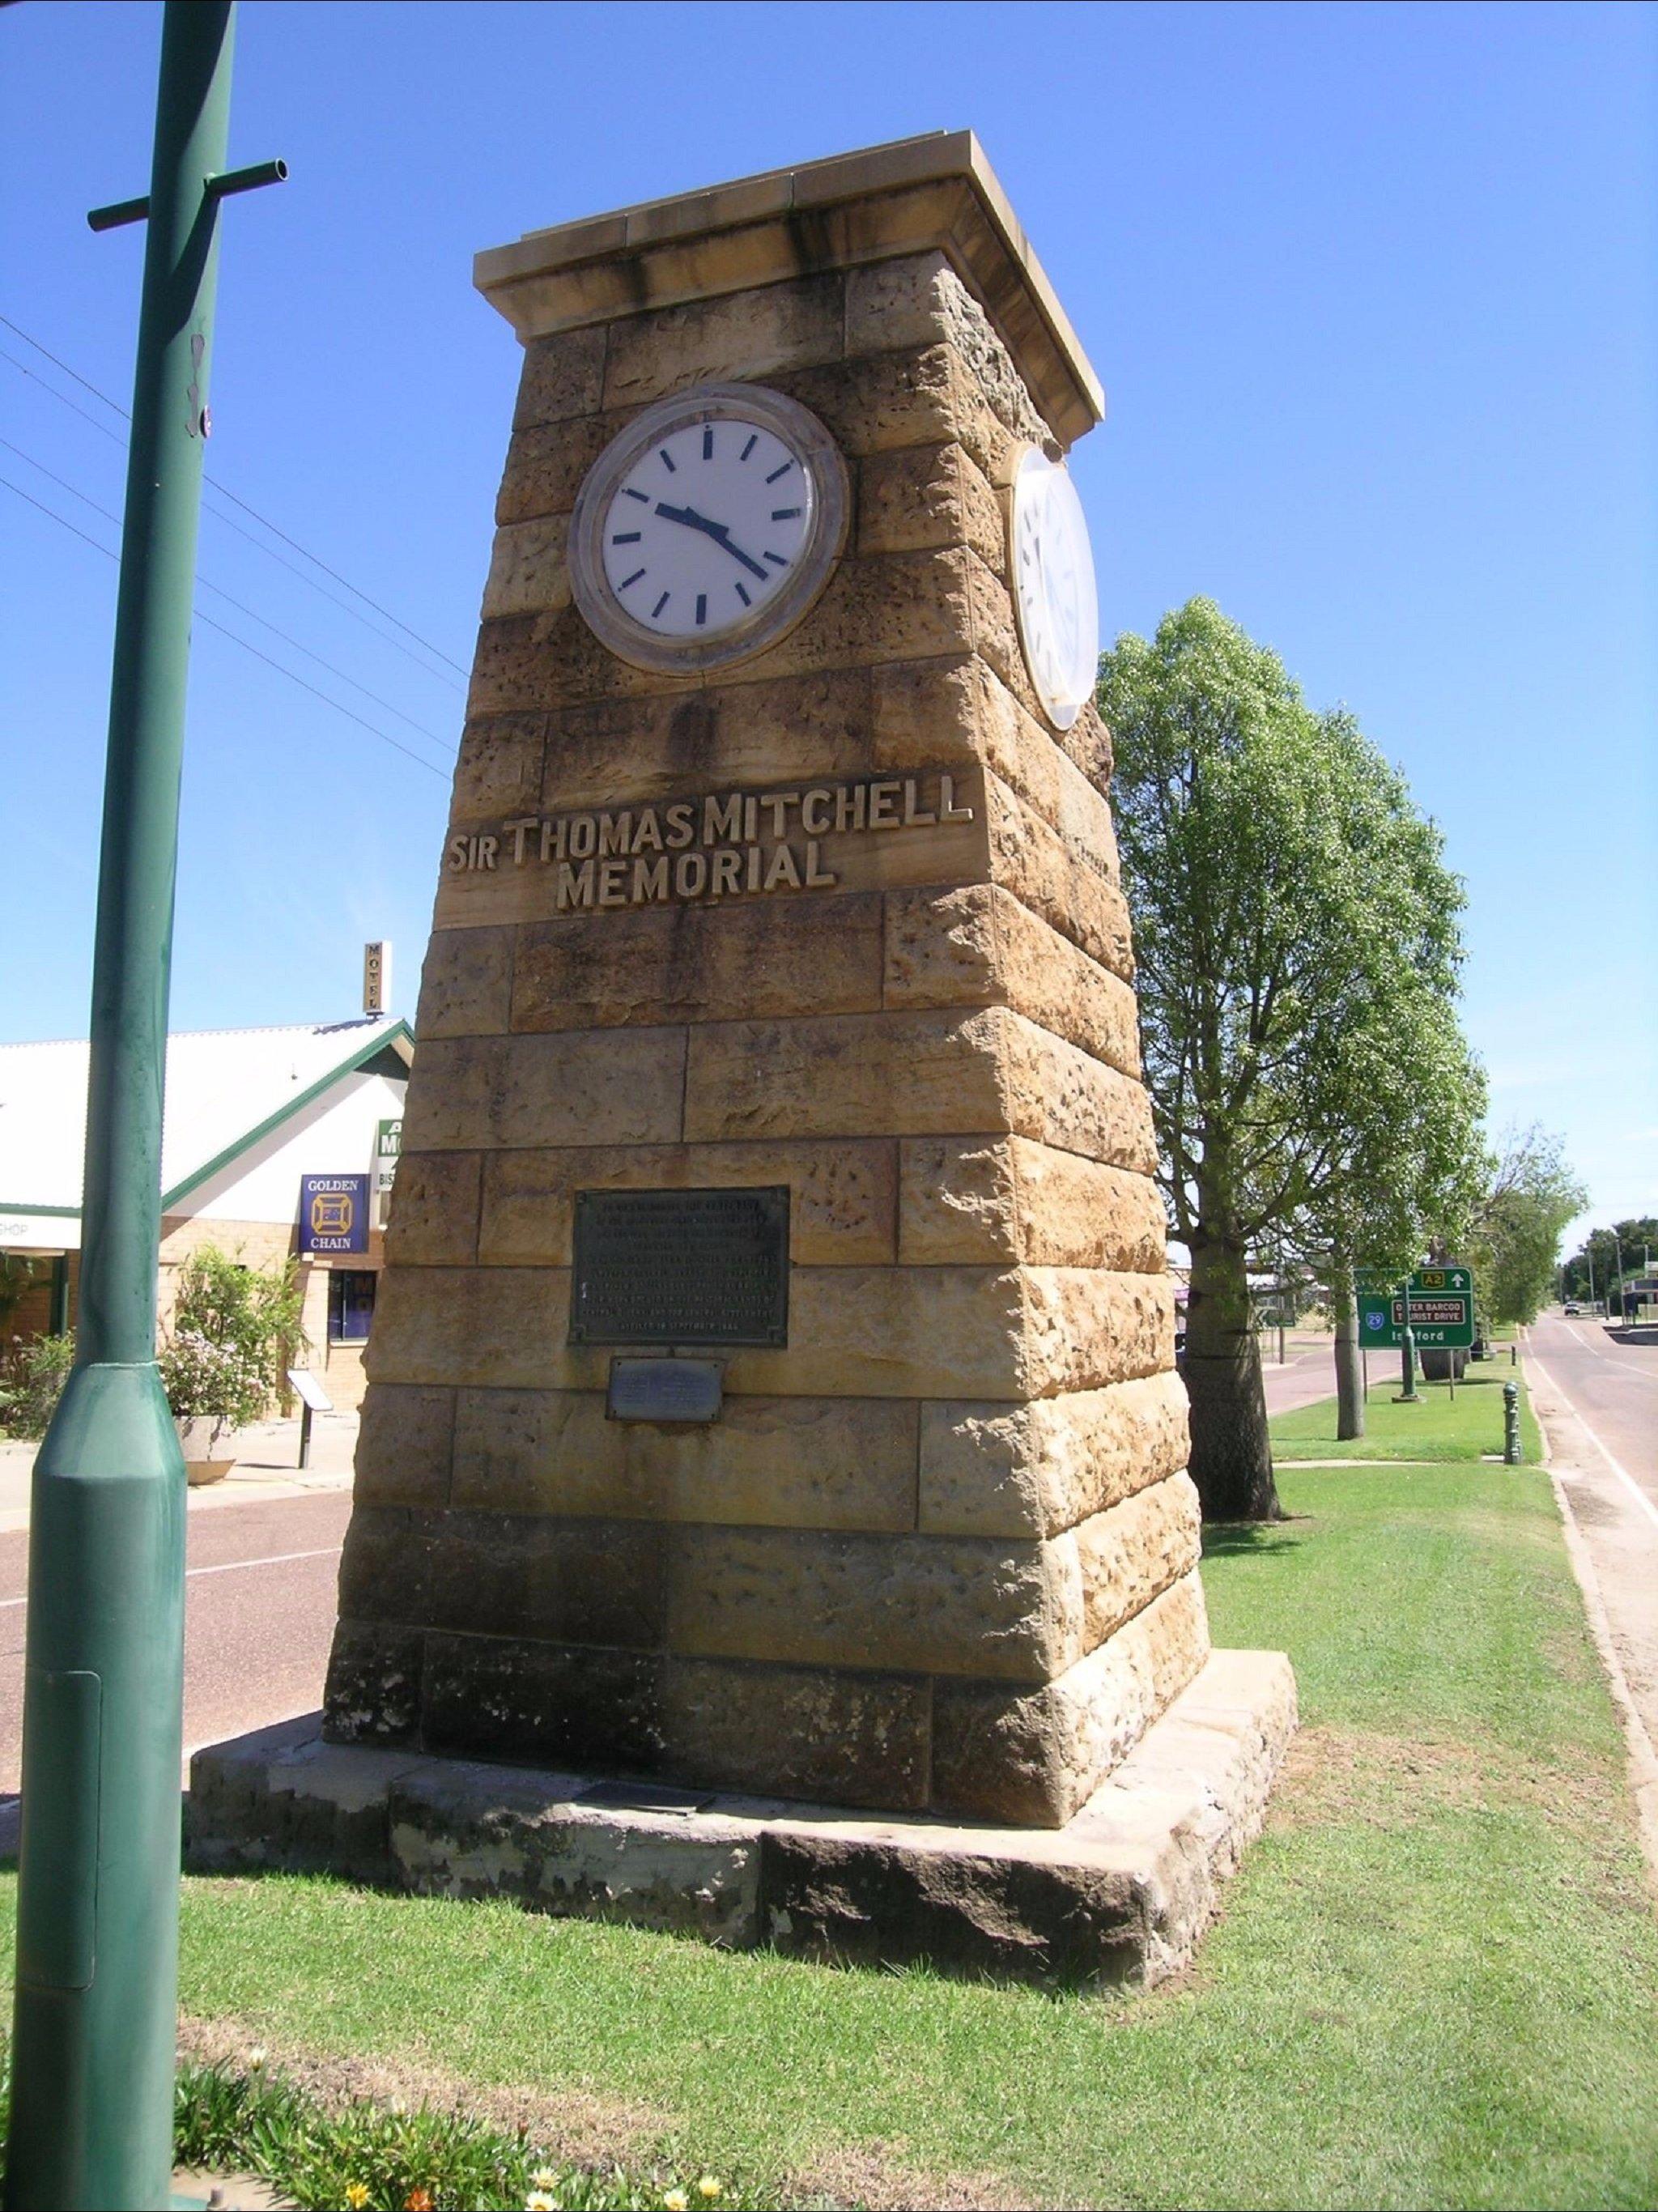 Major Mitchell Memorial